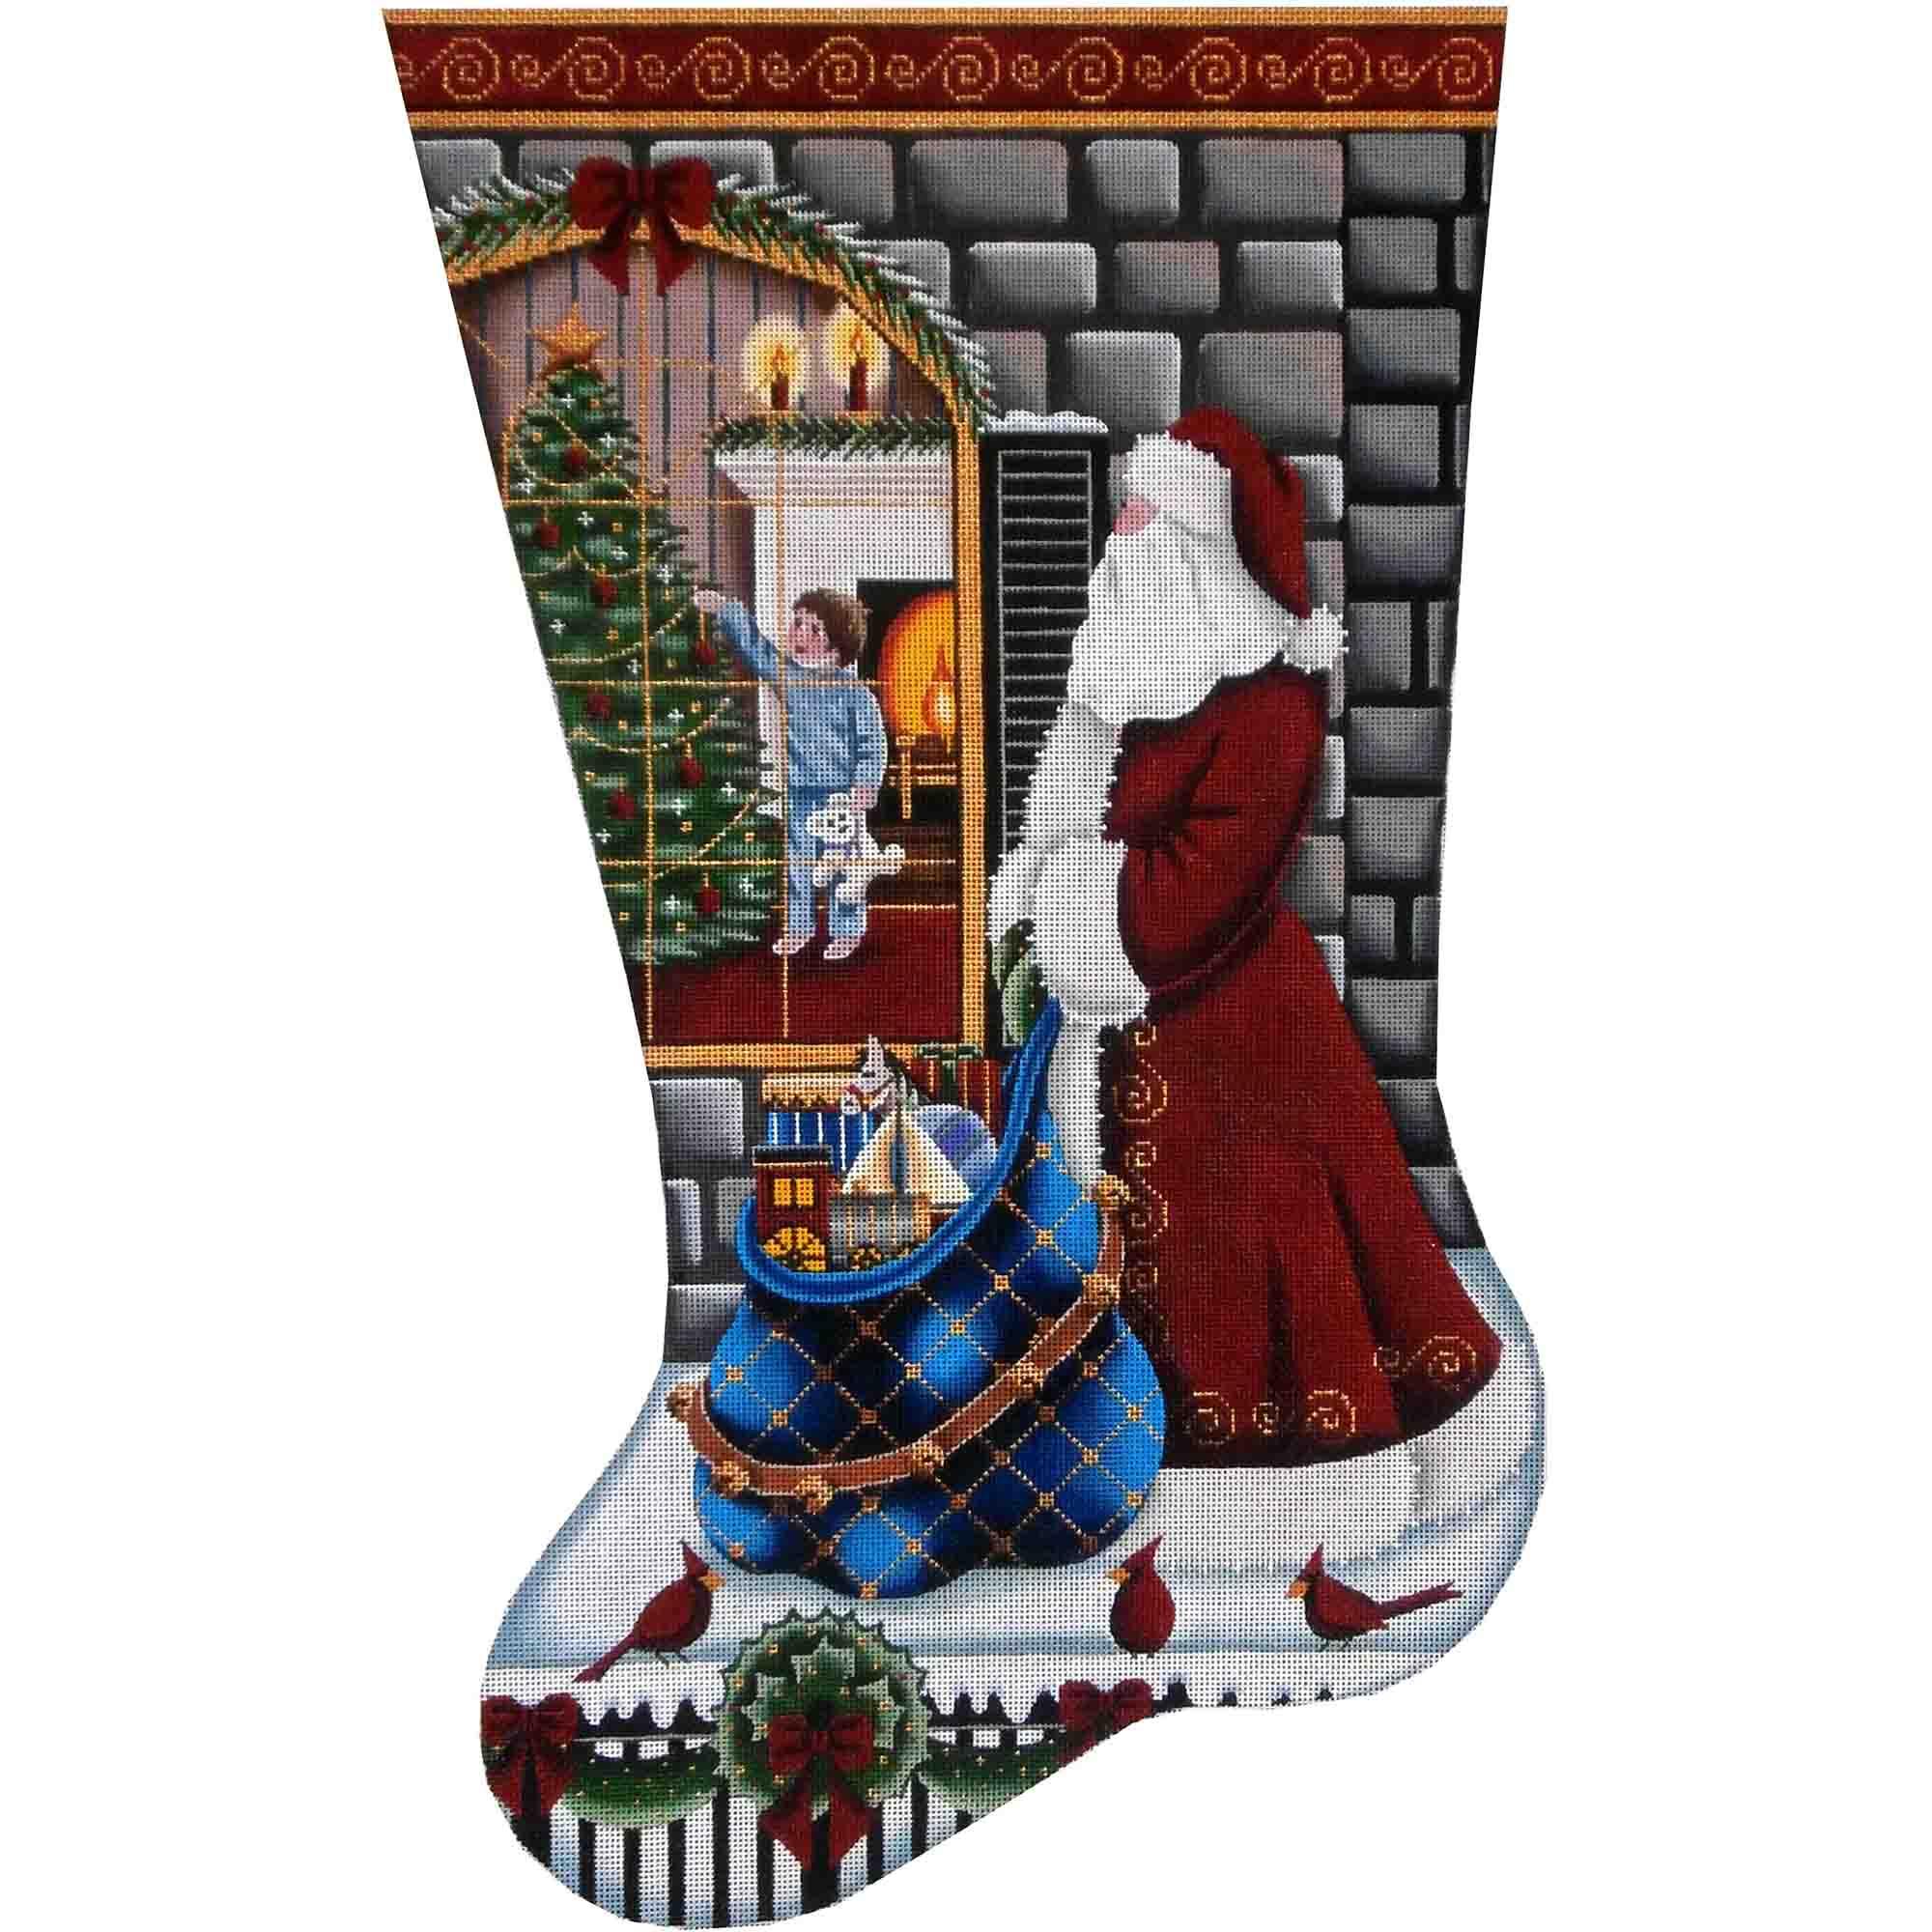 1376b Christmas Eve Magic,B